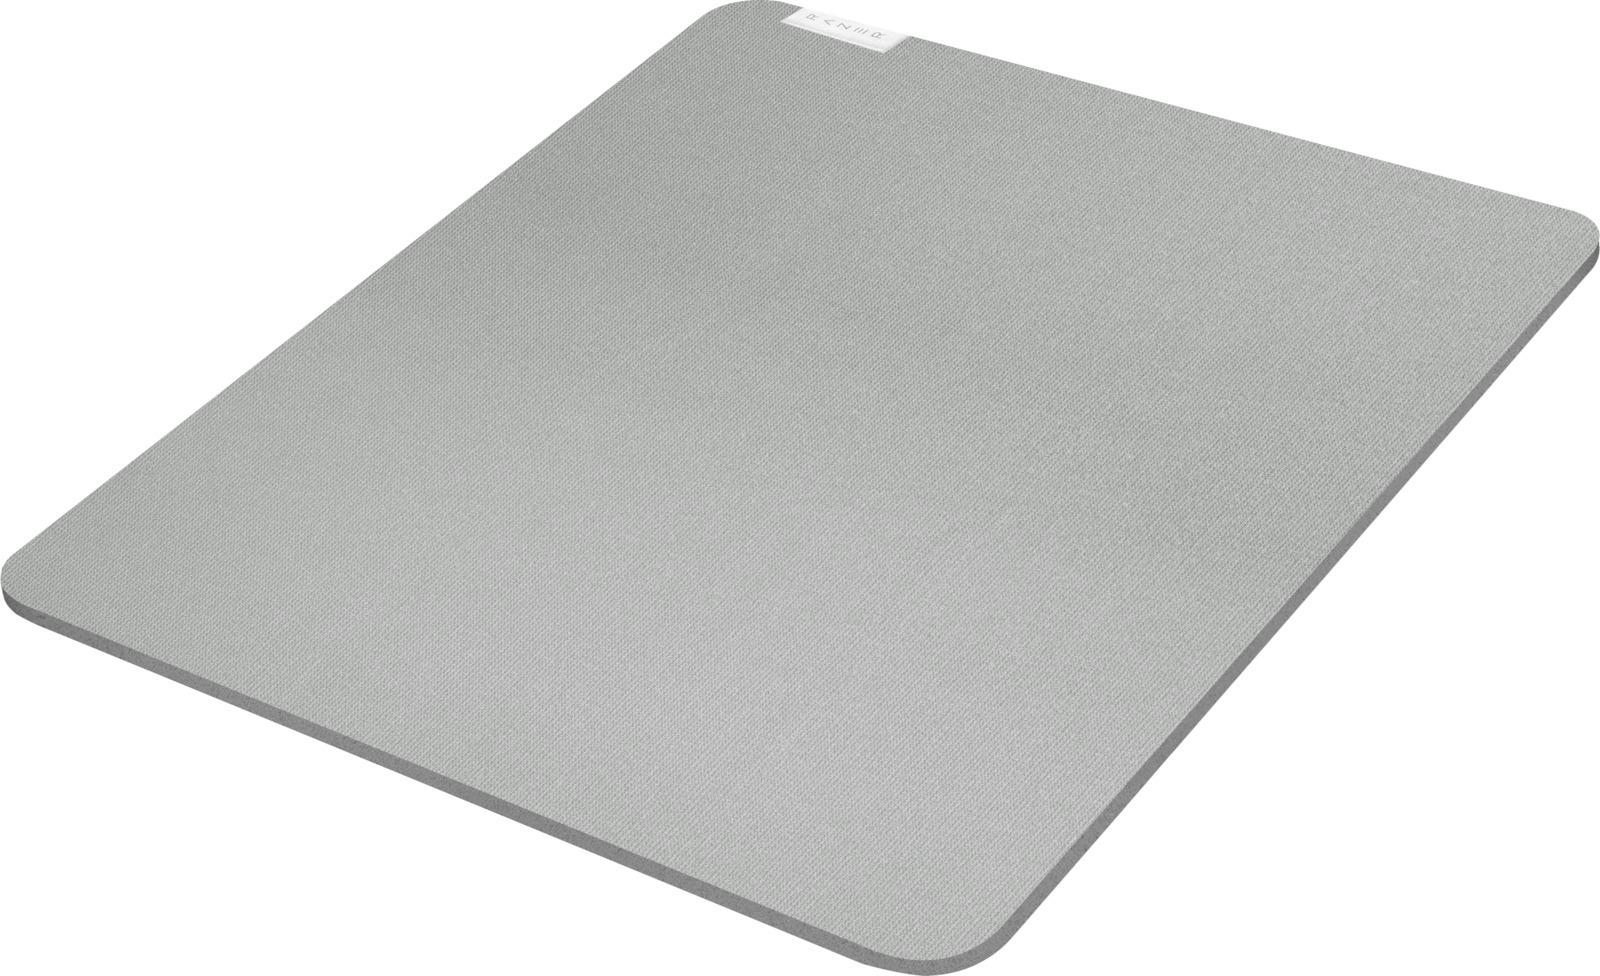 Razer Pro Glide Medium (RZ02-03331500-R3M1) - Πληρωμή και σε έως 36 Δόσεις!!!